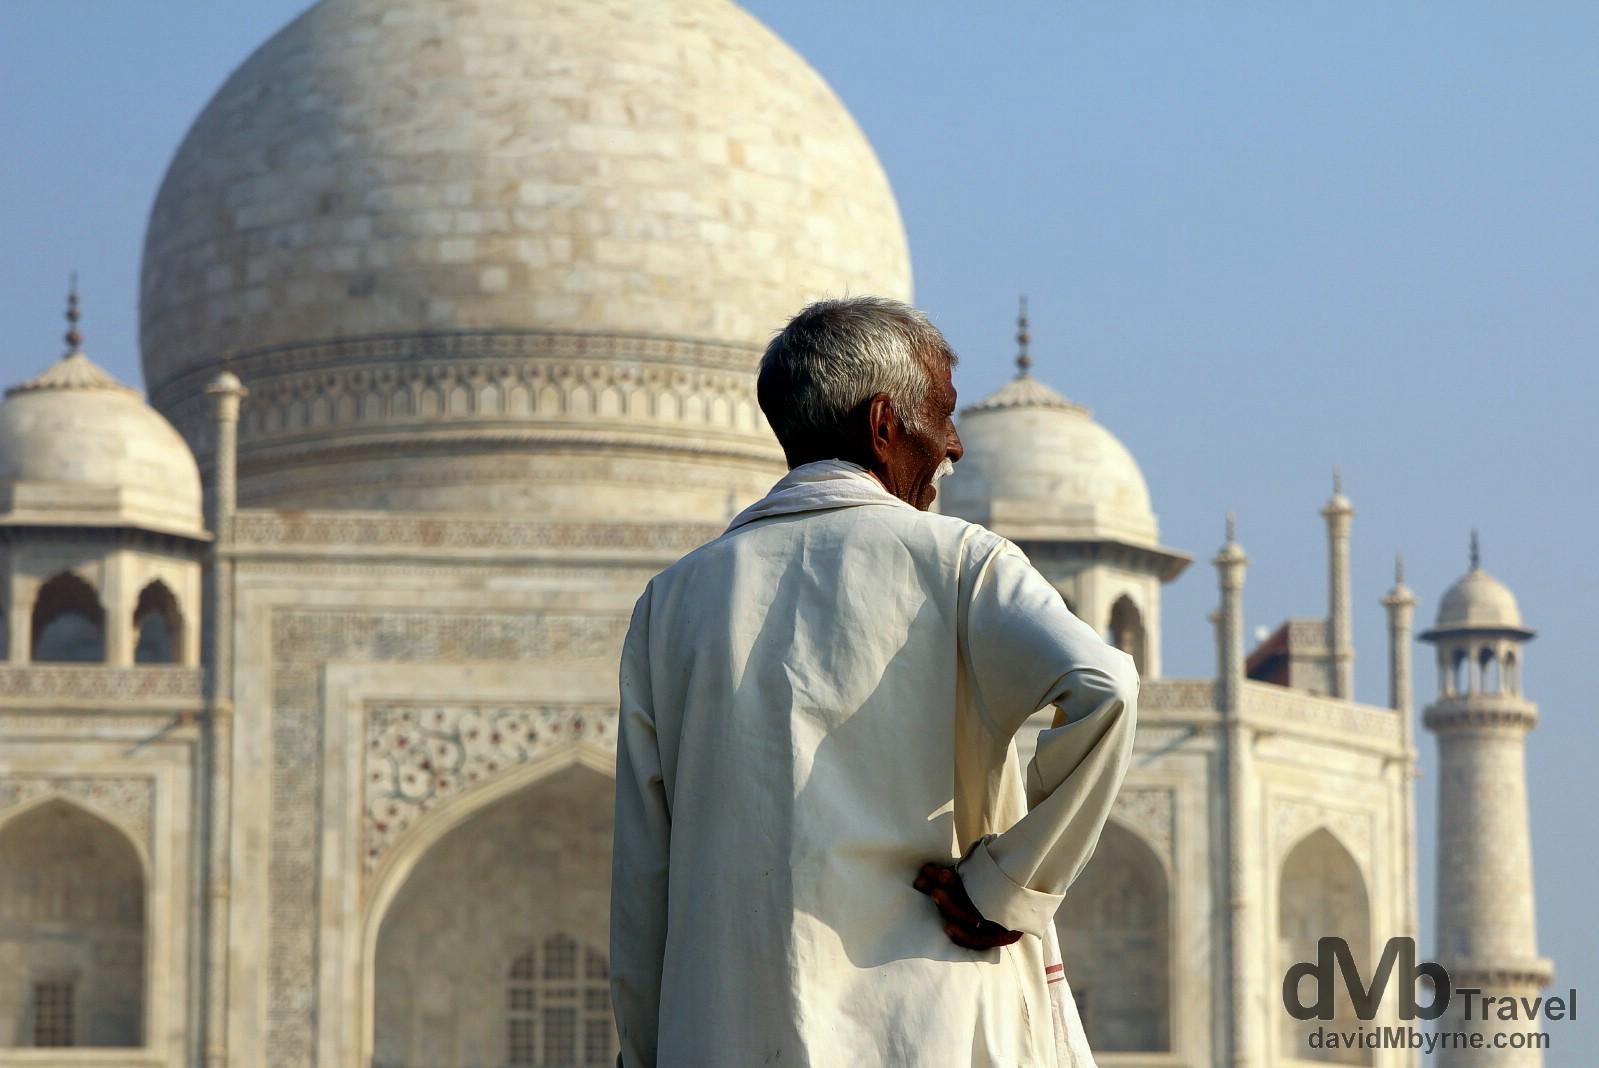 A man fronting the Taj Mahal, Agra, Uttar Pradesh, India. October 11th 2012.